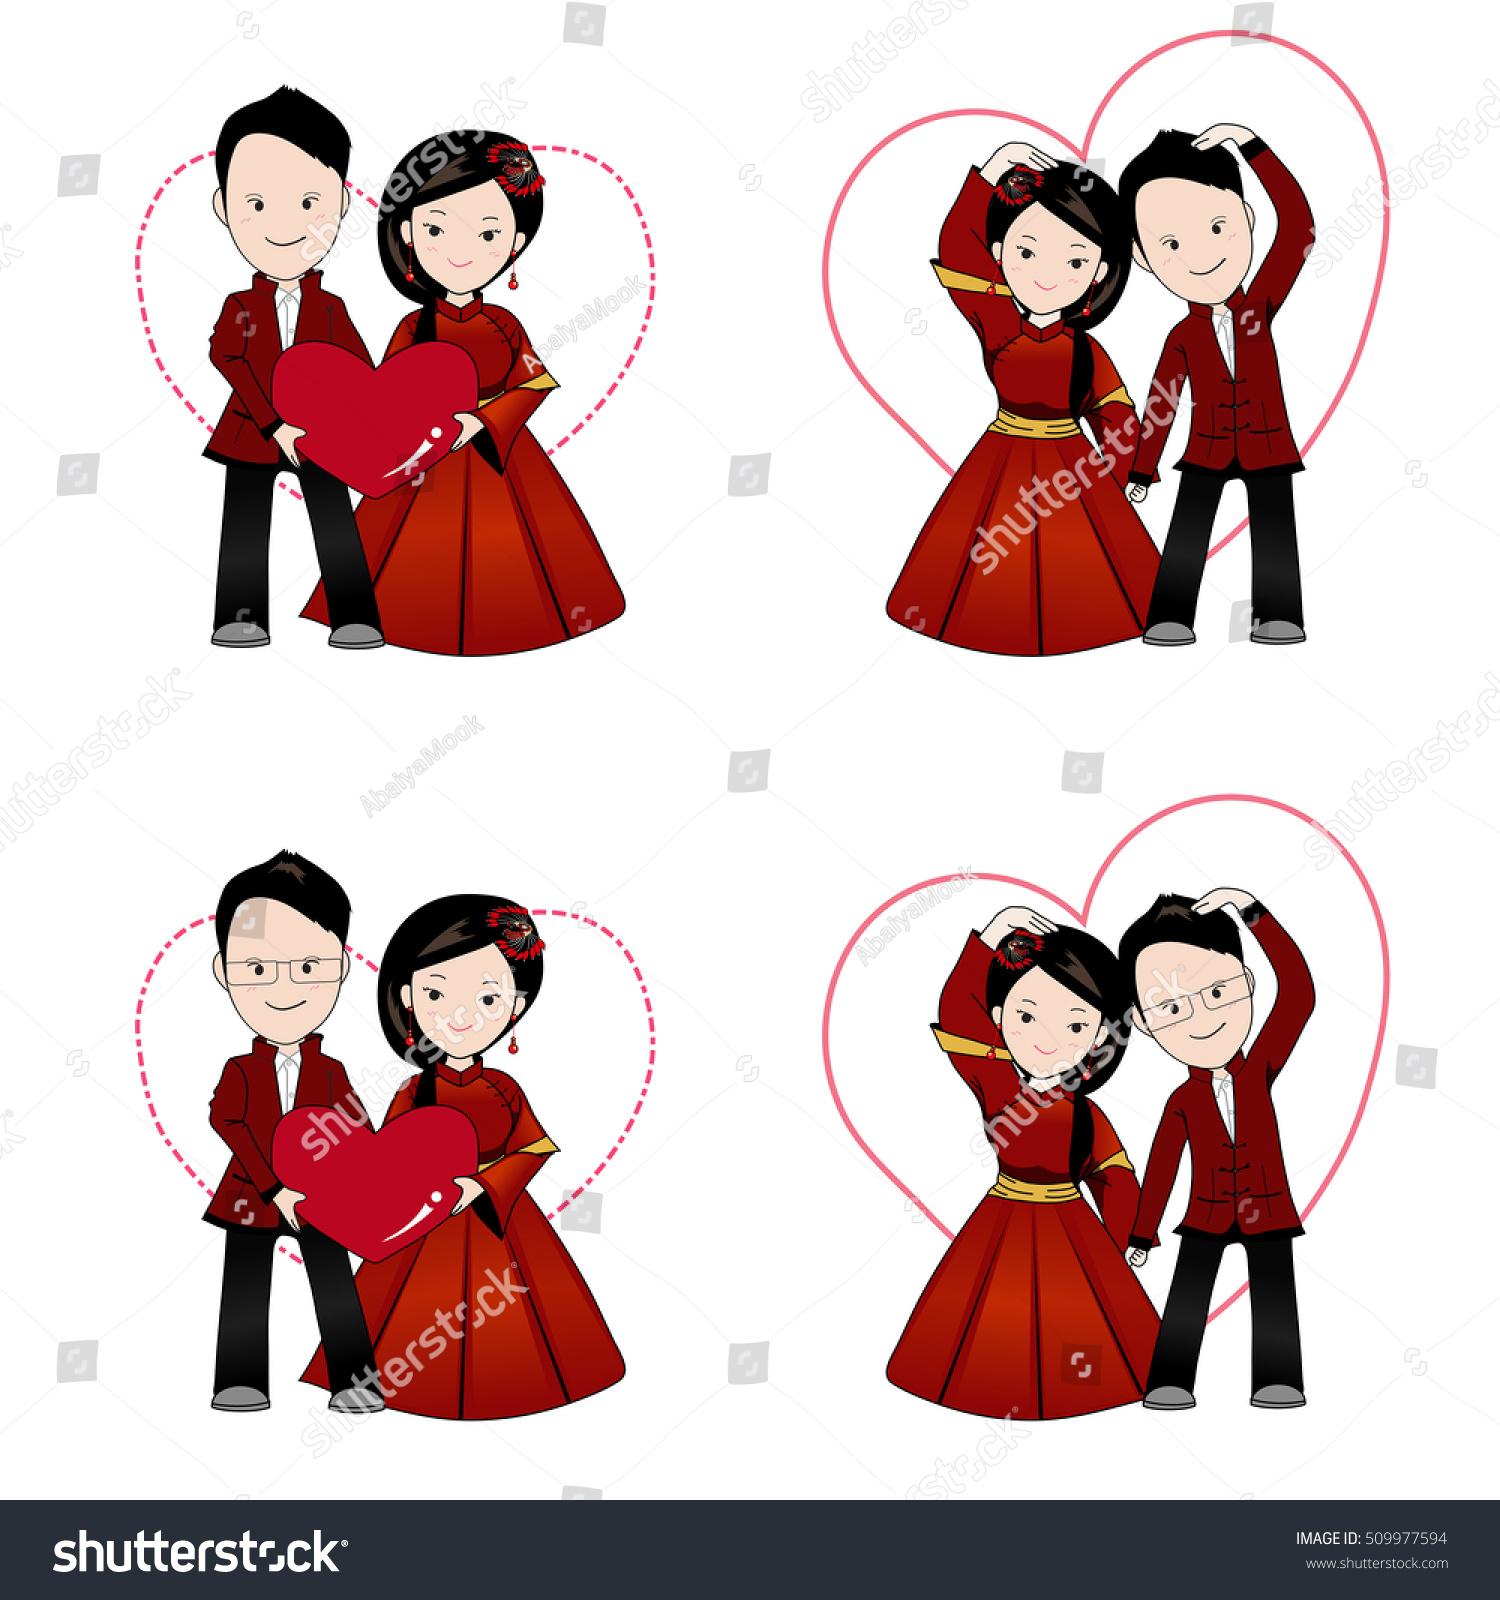 Love Each Other Cartoon: Chinese Wedding Cartoon Bride Groom Holding Stock Vector